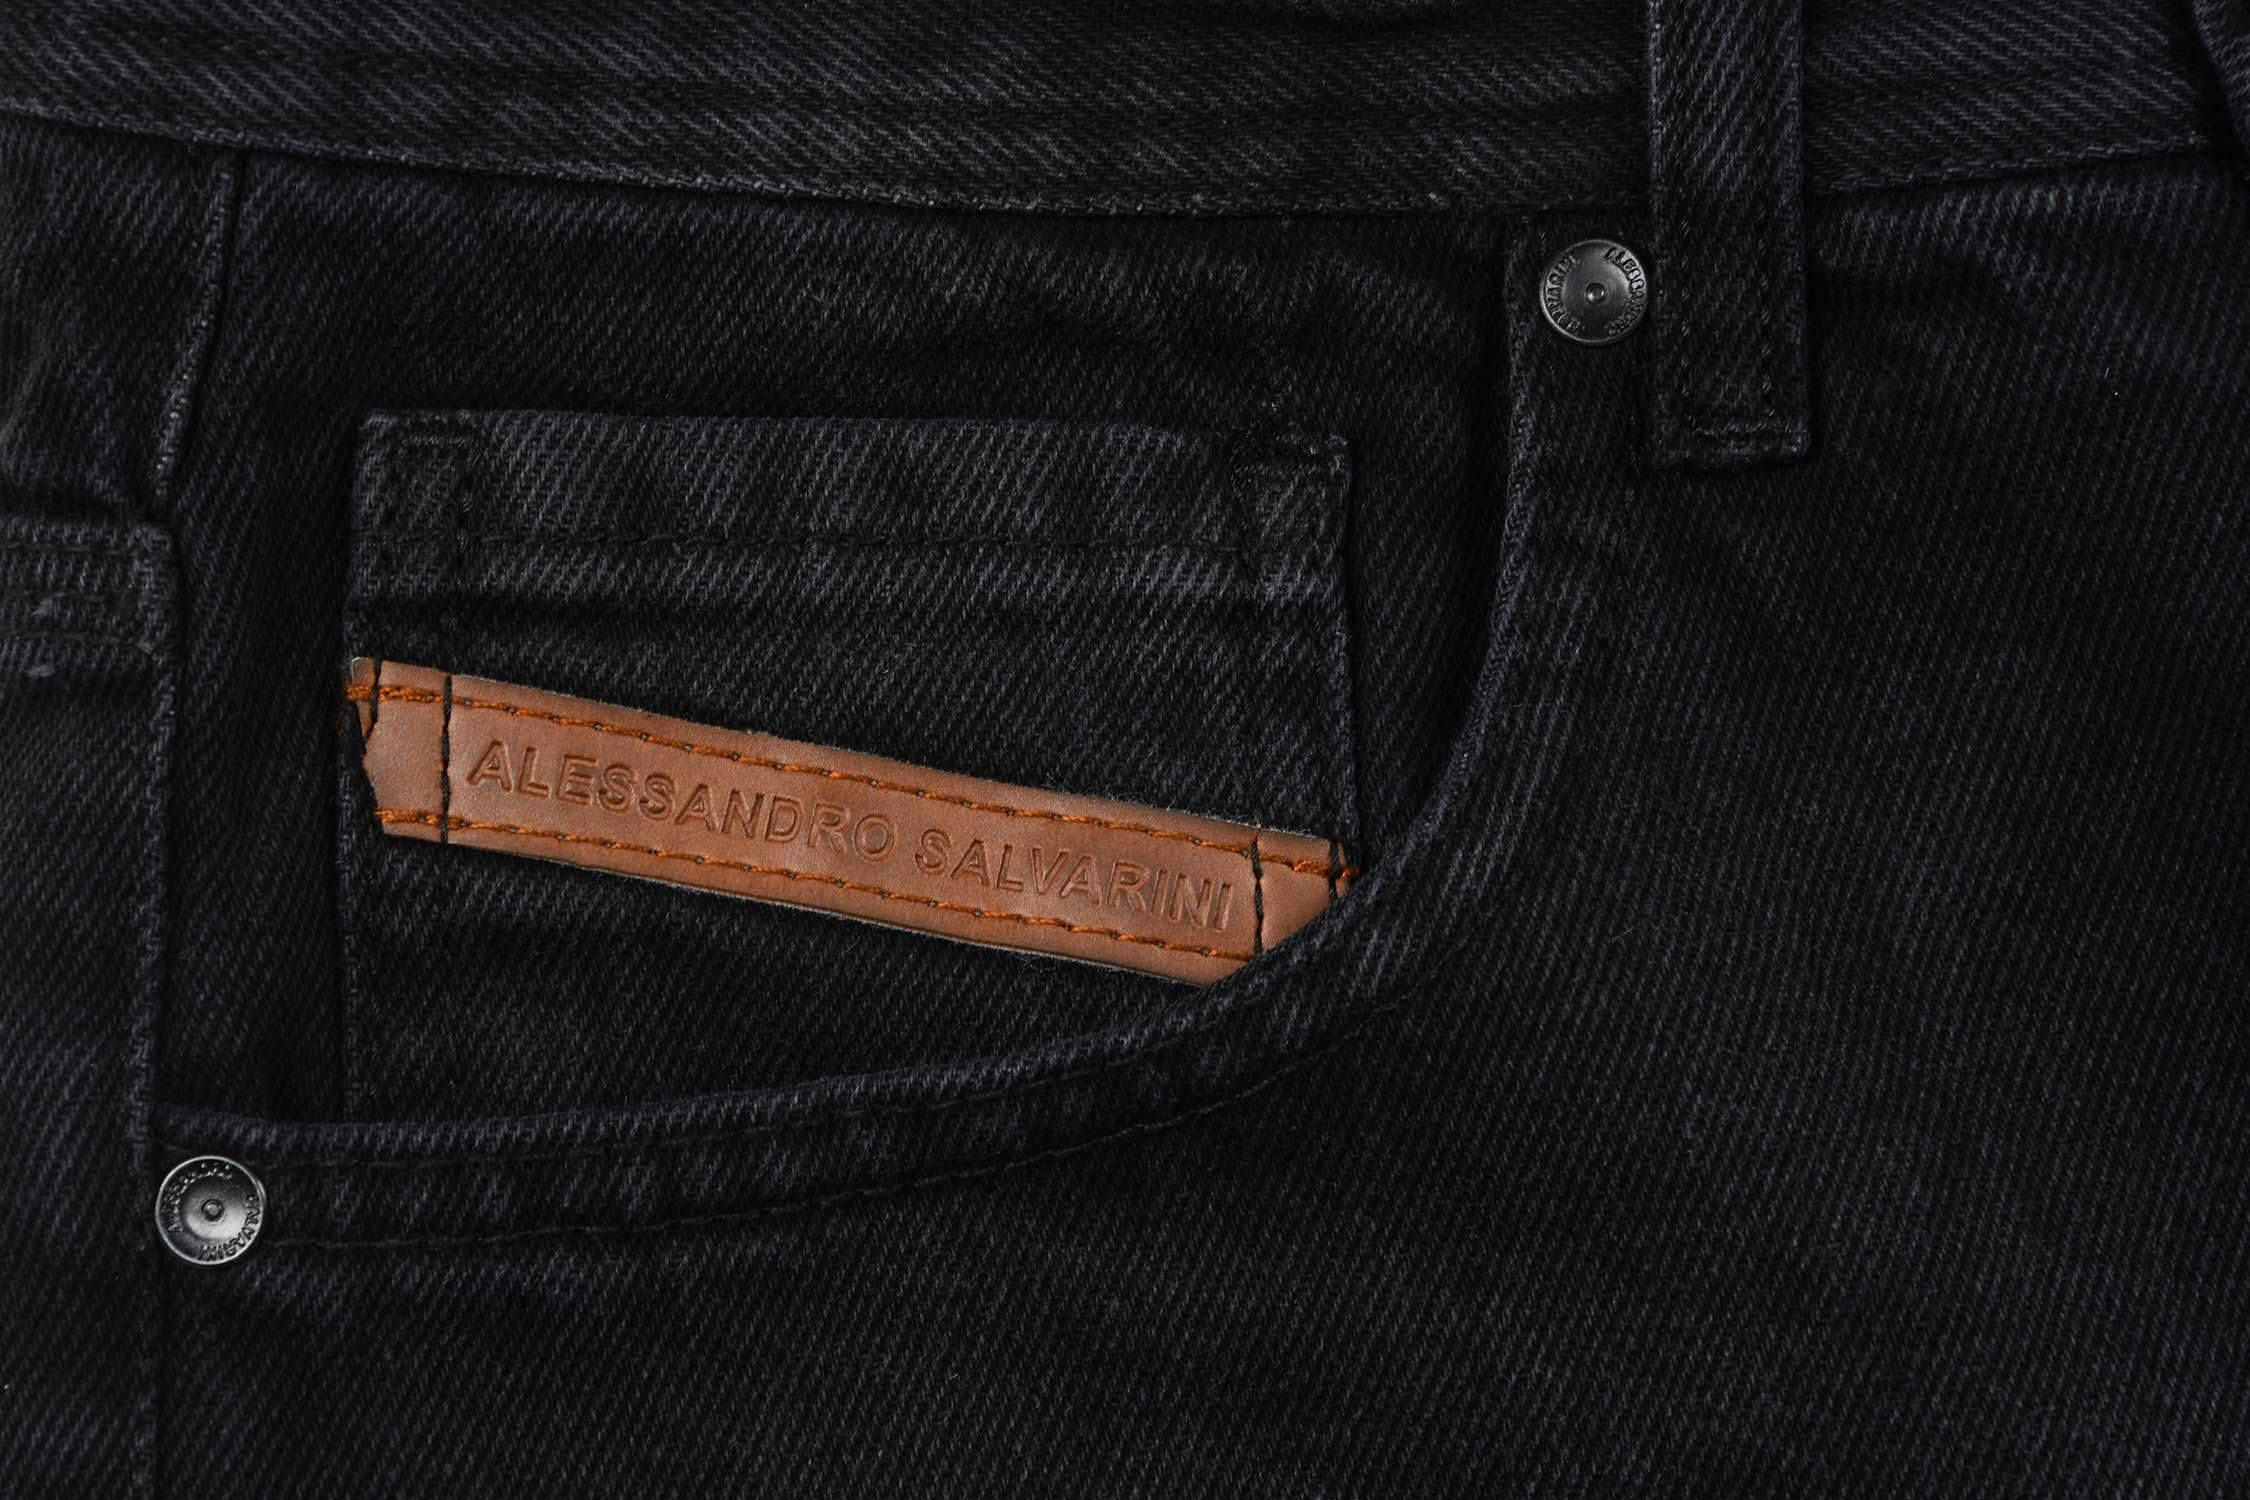 A-Salvarini-Designer-Herren-Jeans-Short-kurze-Sommer-Hose-Jeansshorts-Bermuda Indexbild 30